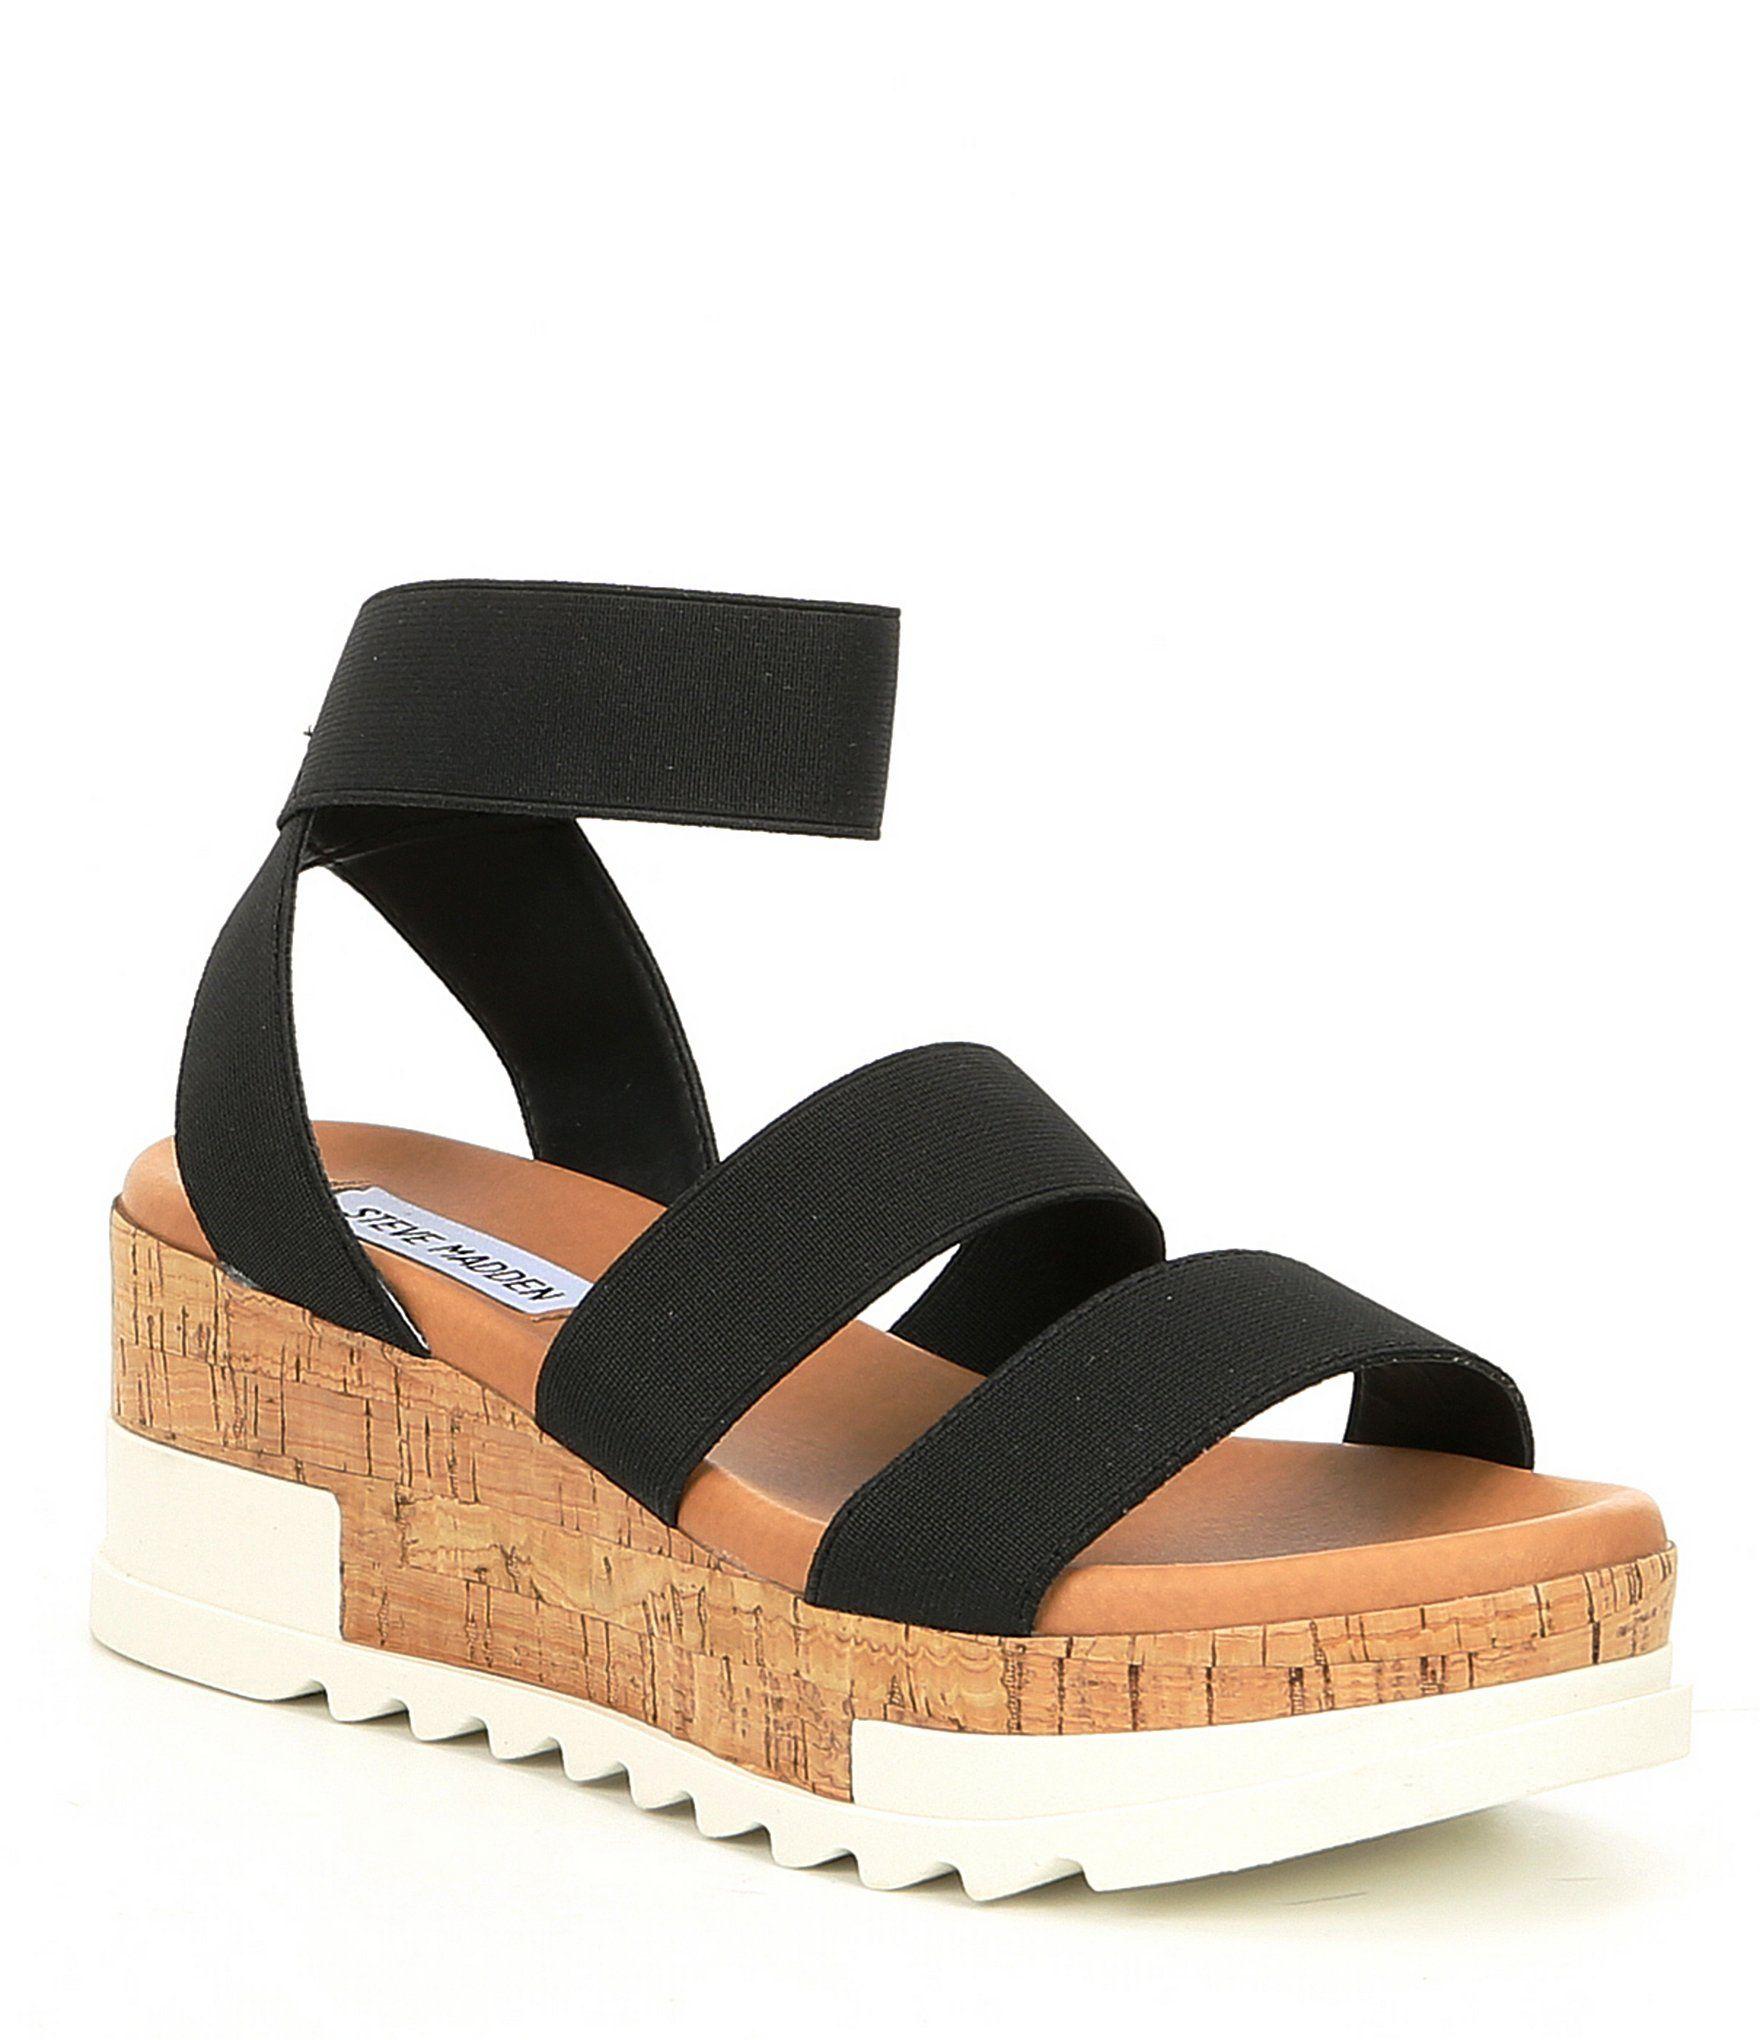 50120f3cfd5 Shop for Steve Madden Bandi Elastic Platform Sandals at Dillards.com. Visit  Dillards.